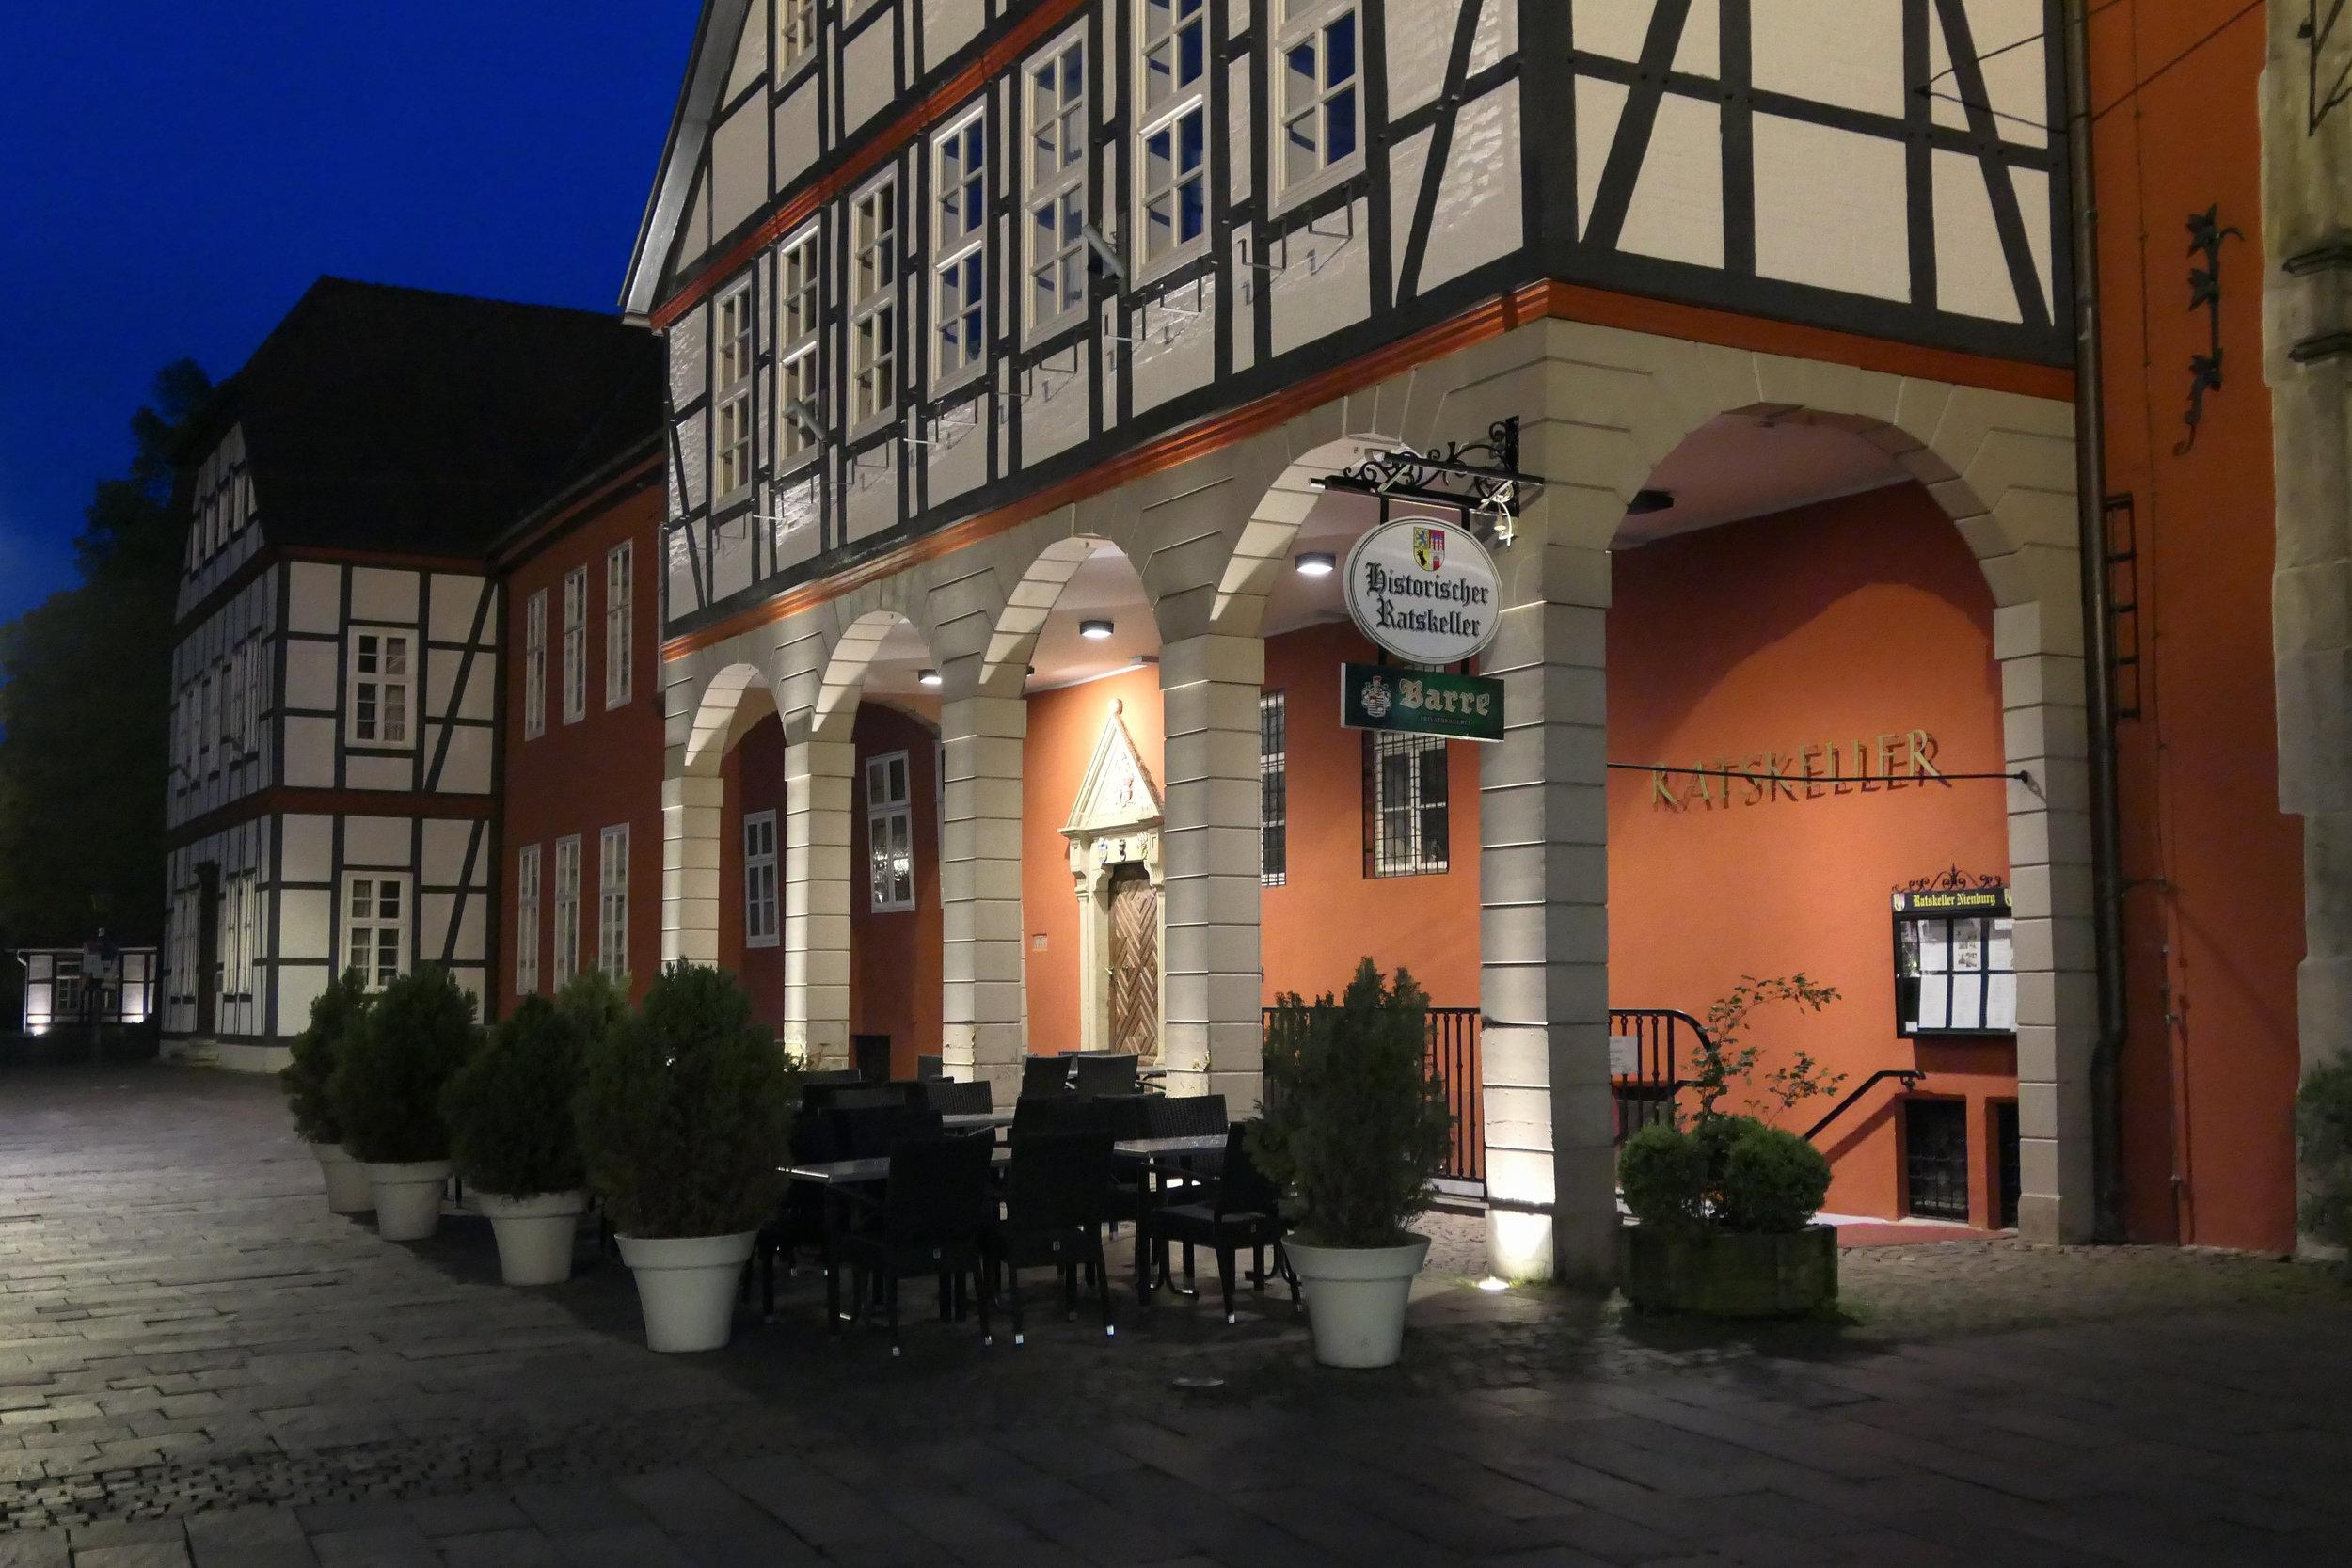 maiwanderfahrt-weser-2019-2_0162_2019-04-29_20-29-31.jpg